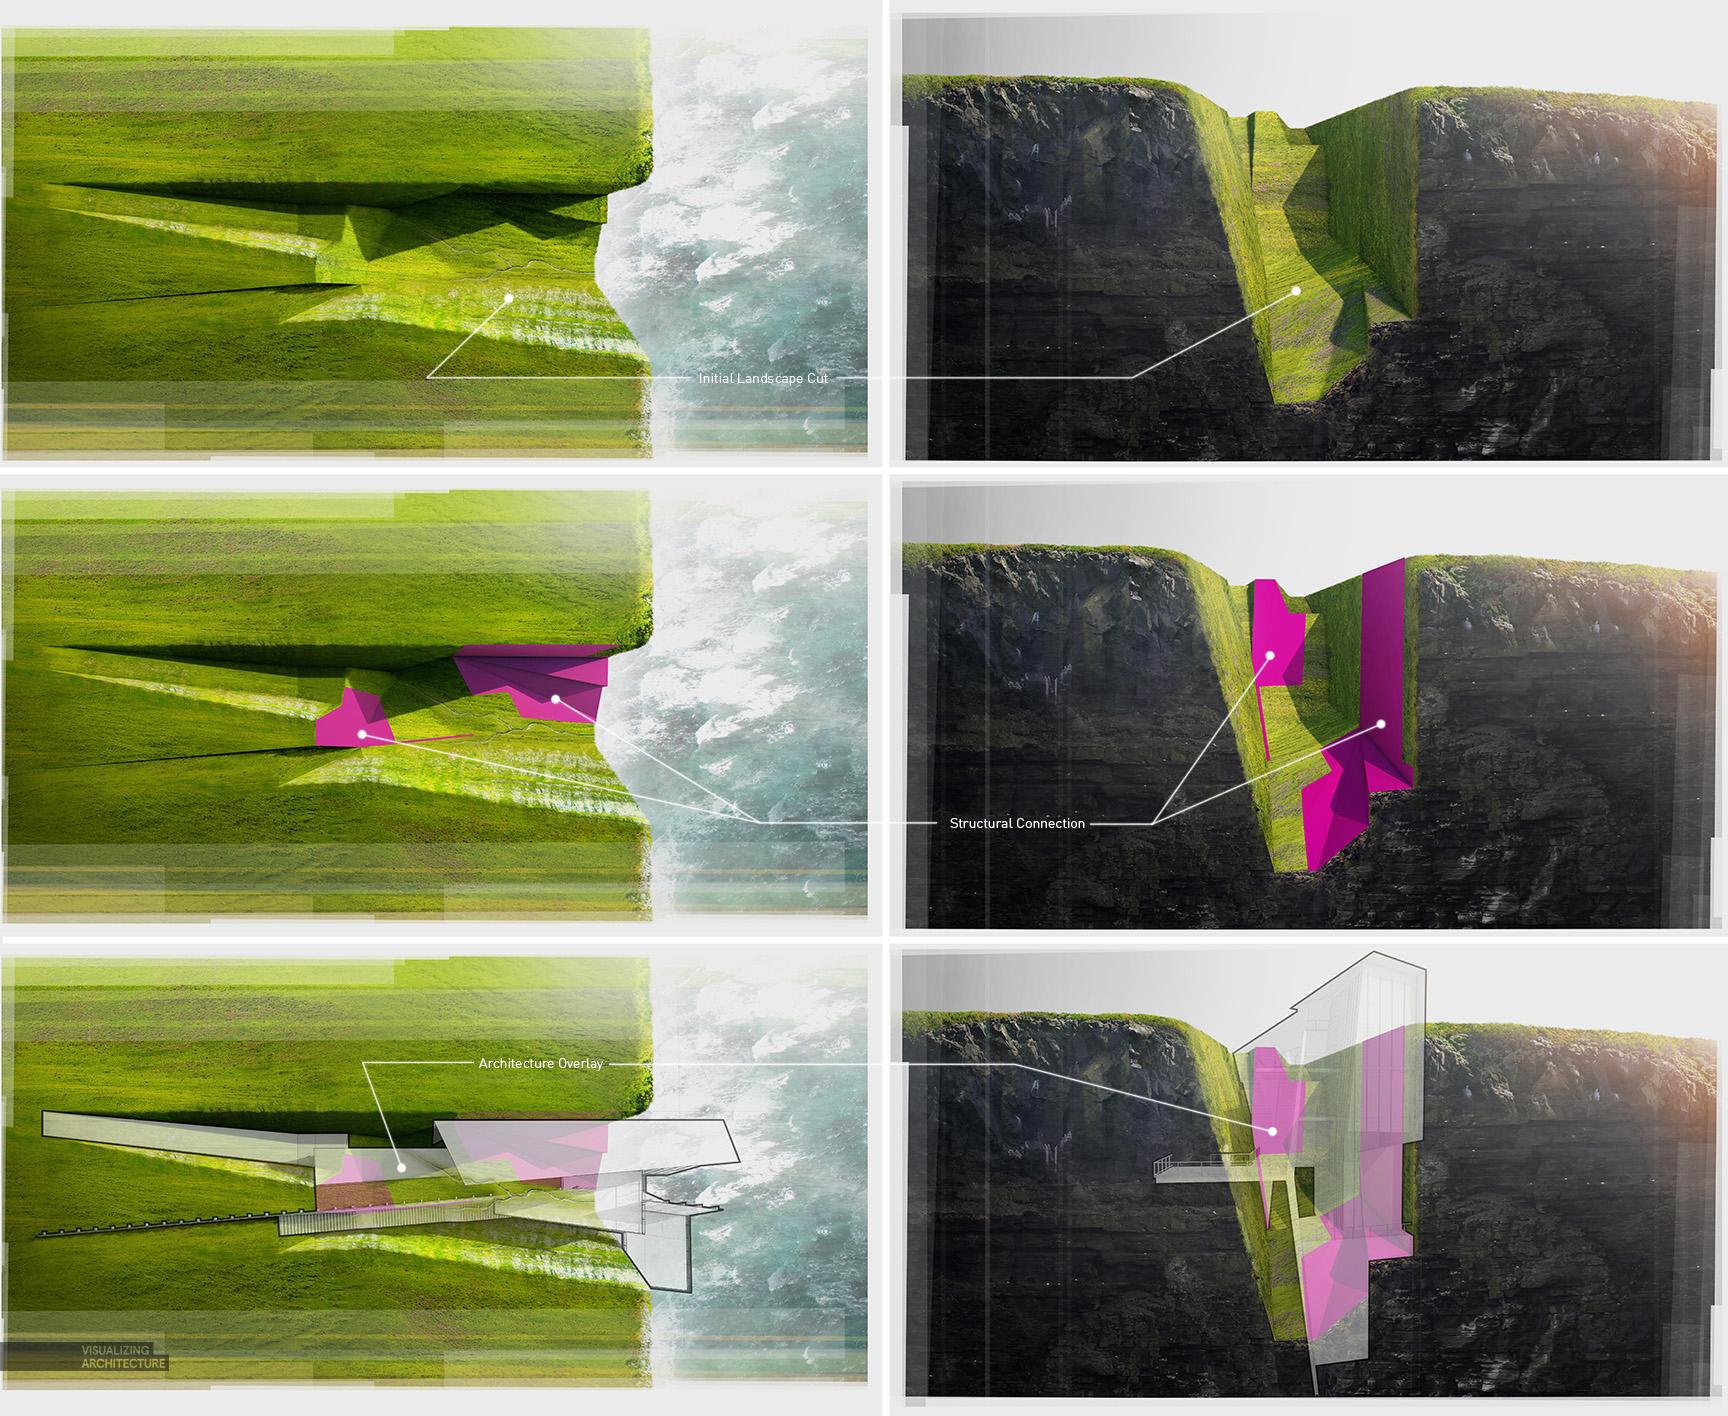 cliff_diagram_1_final2